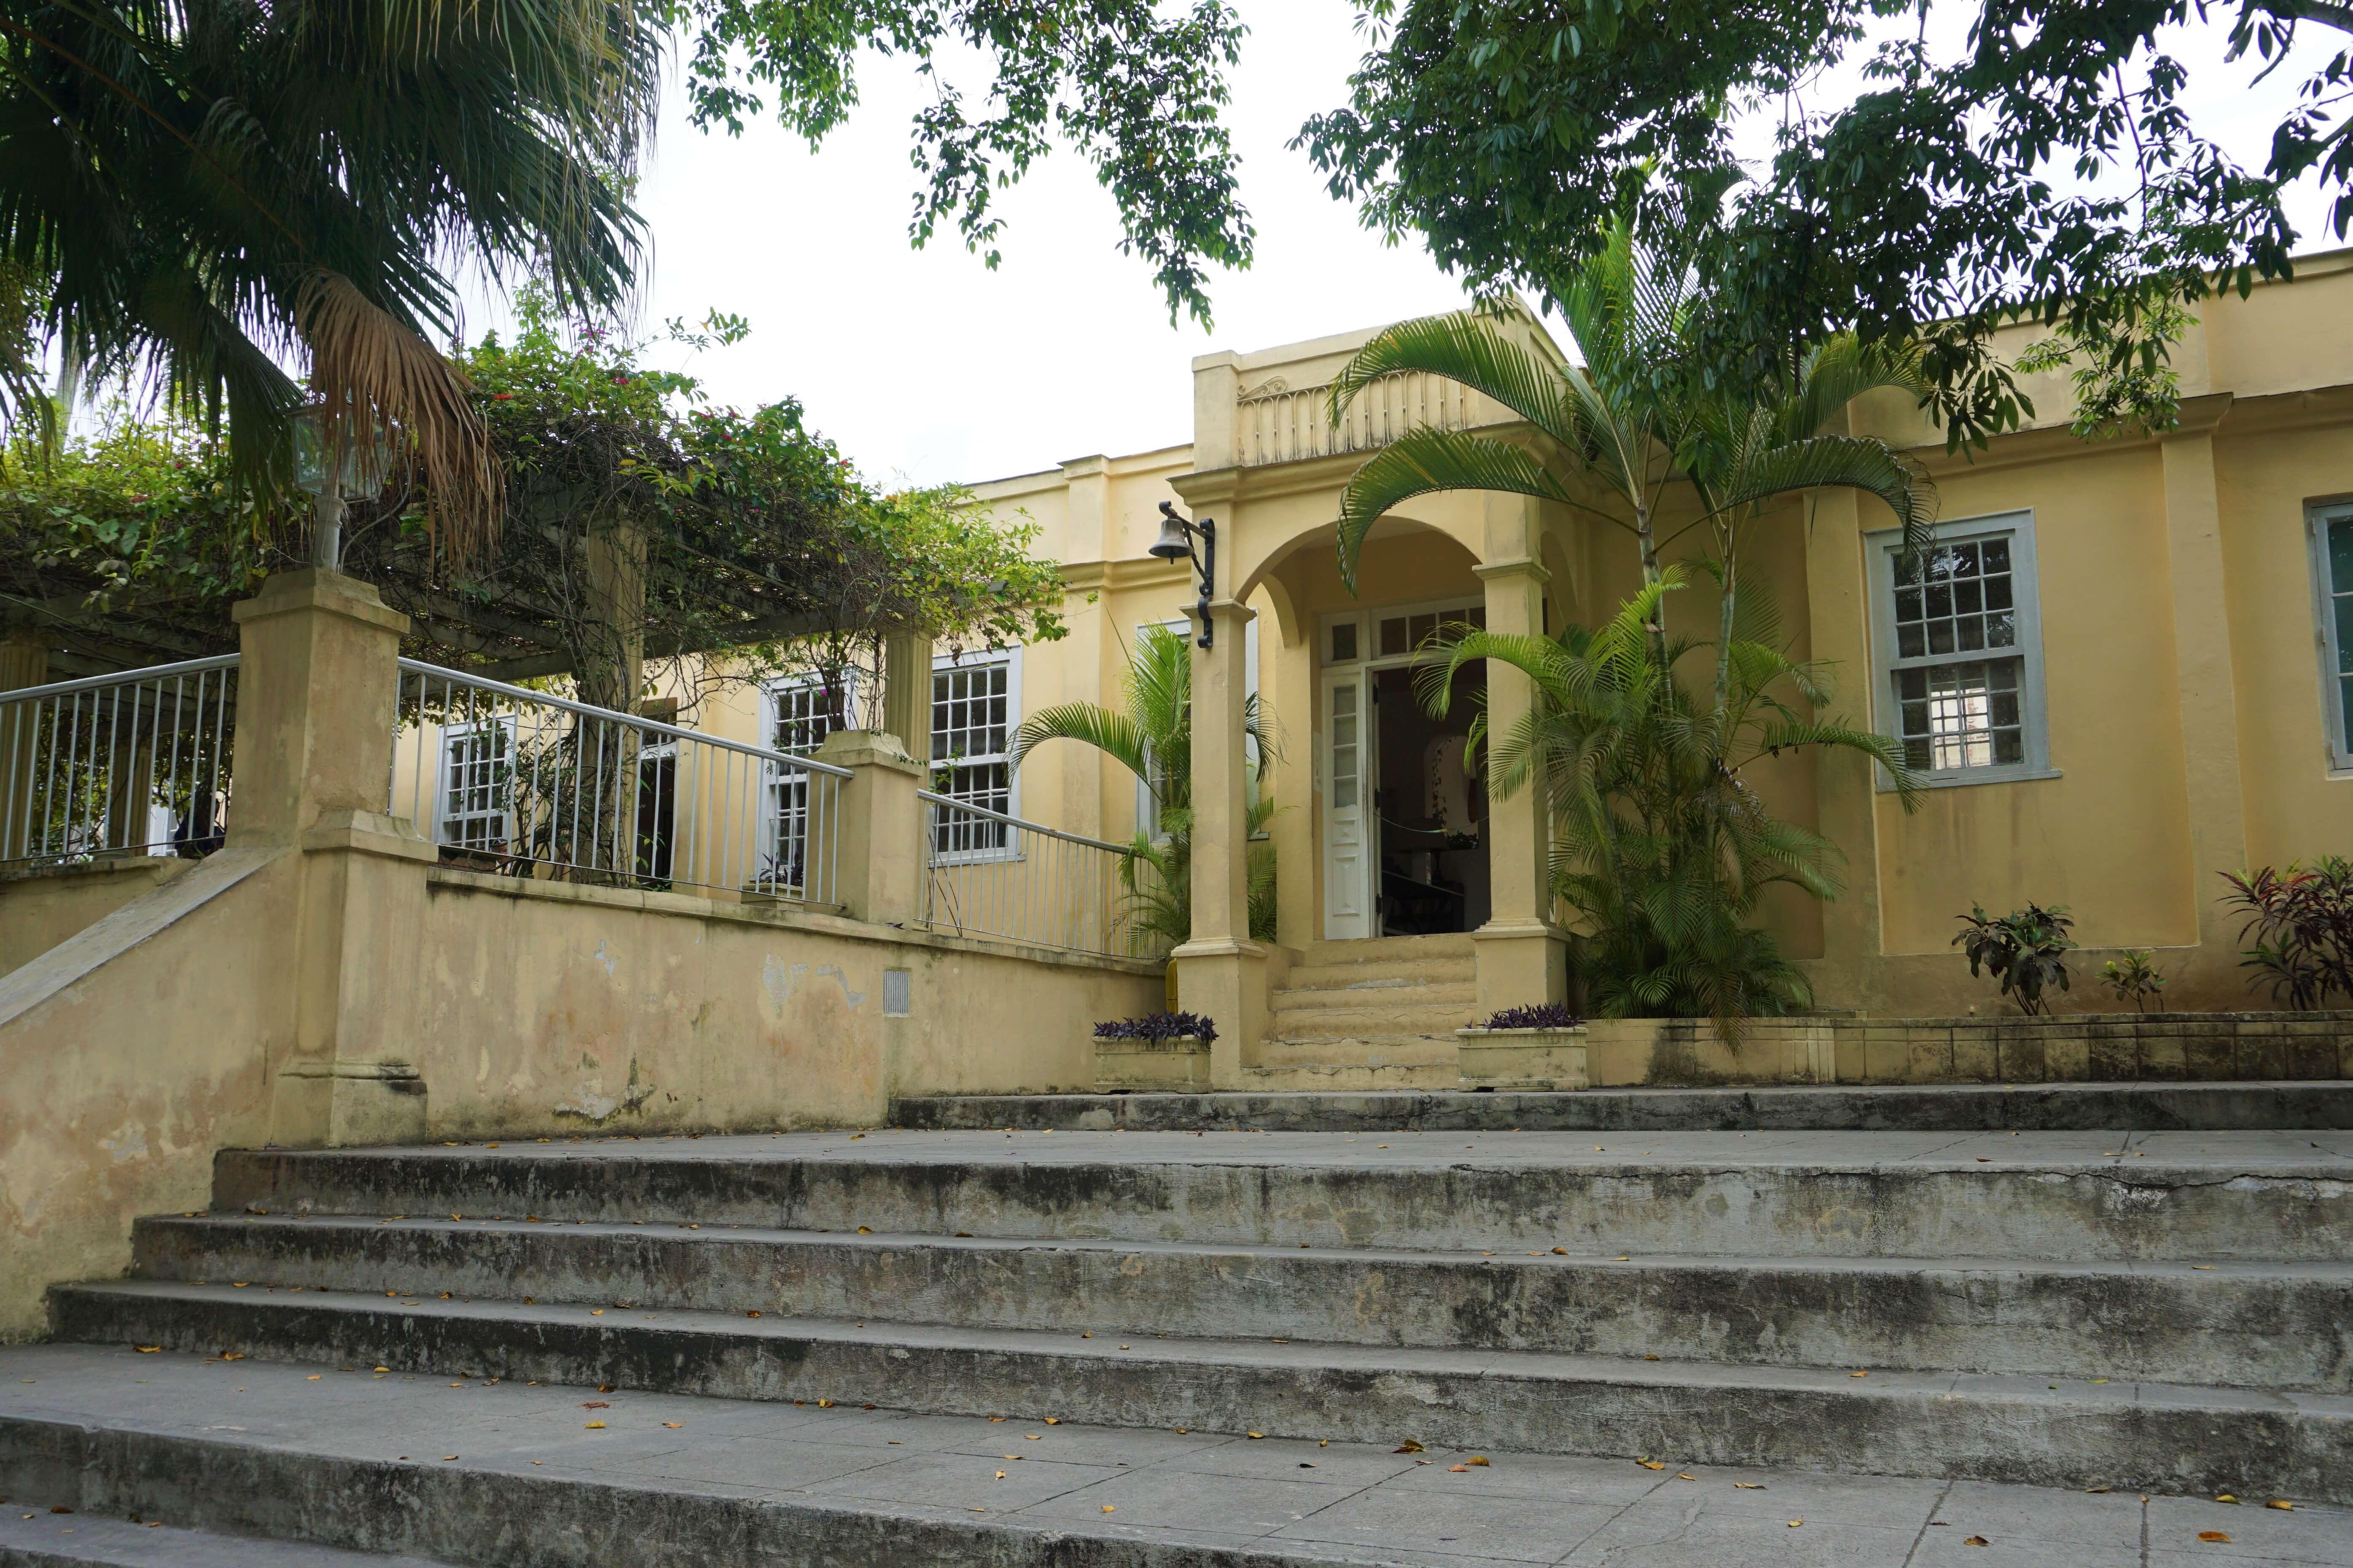 Hemingway's home in Cuba, Finca Vigia